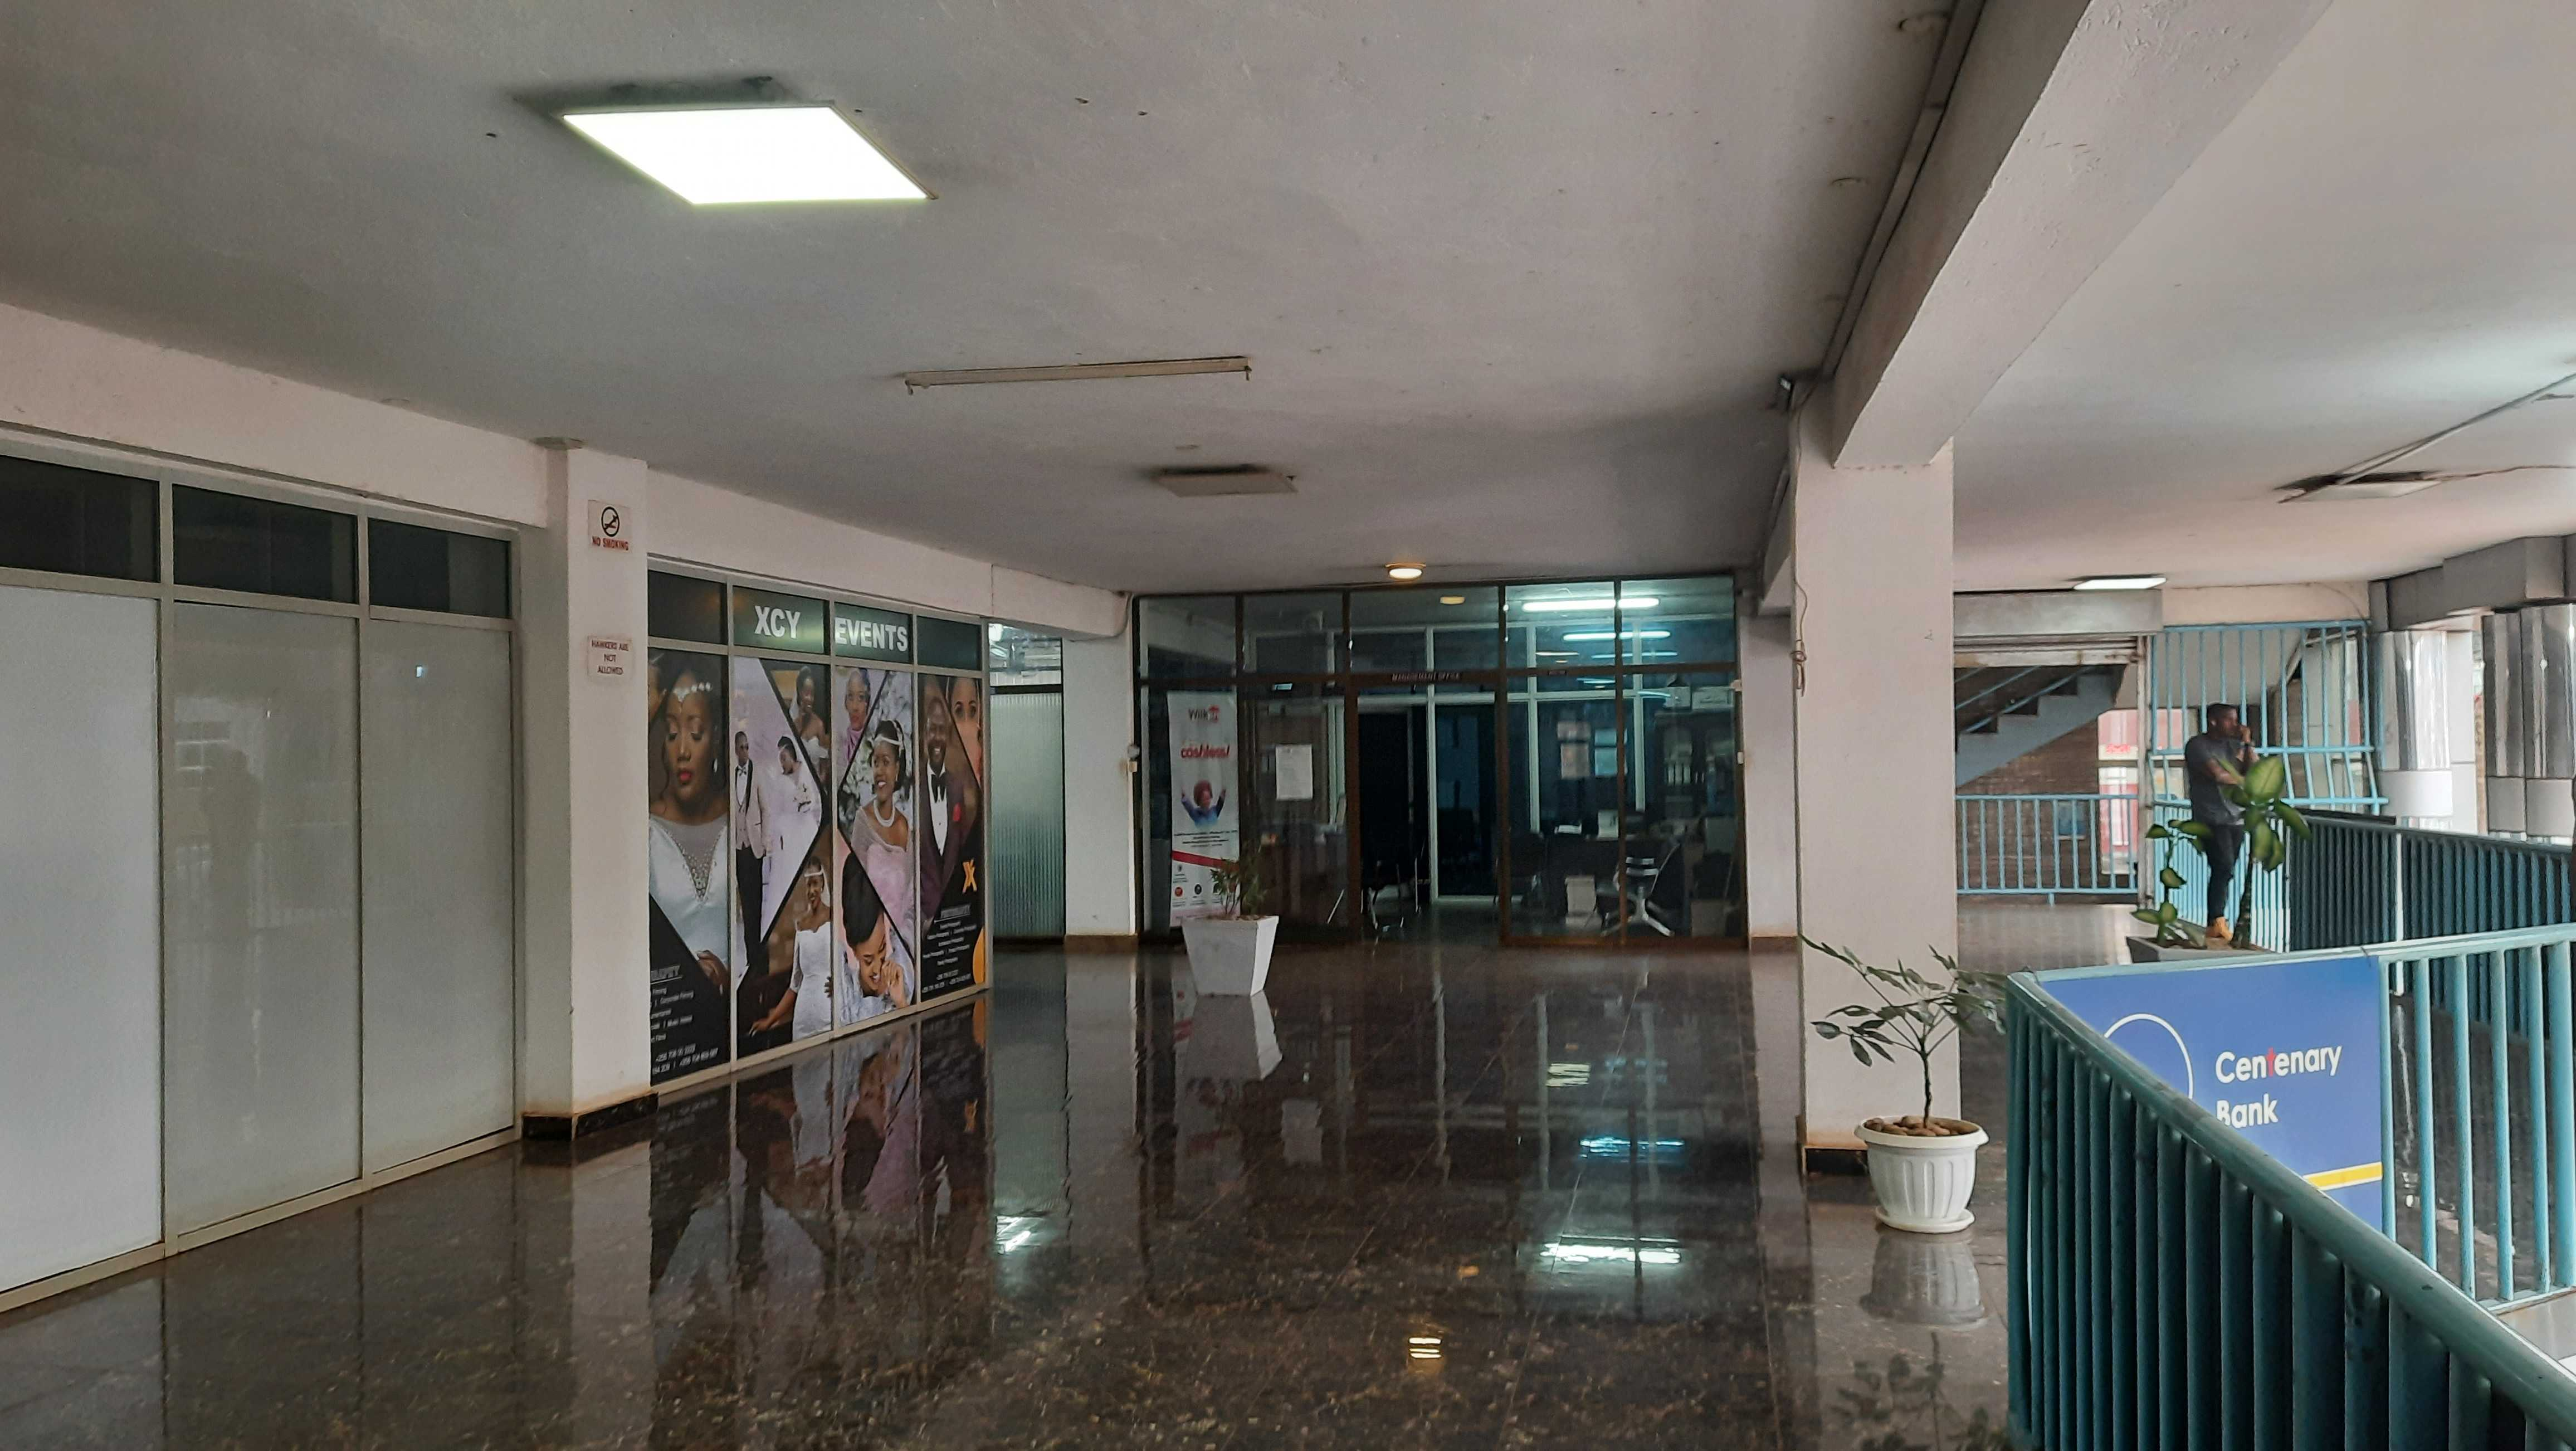 Access Level 0 (Ground floor)